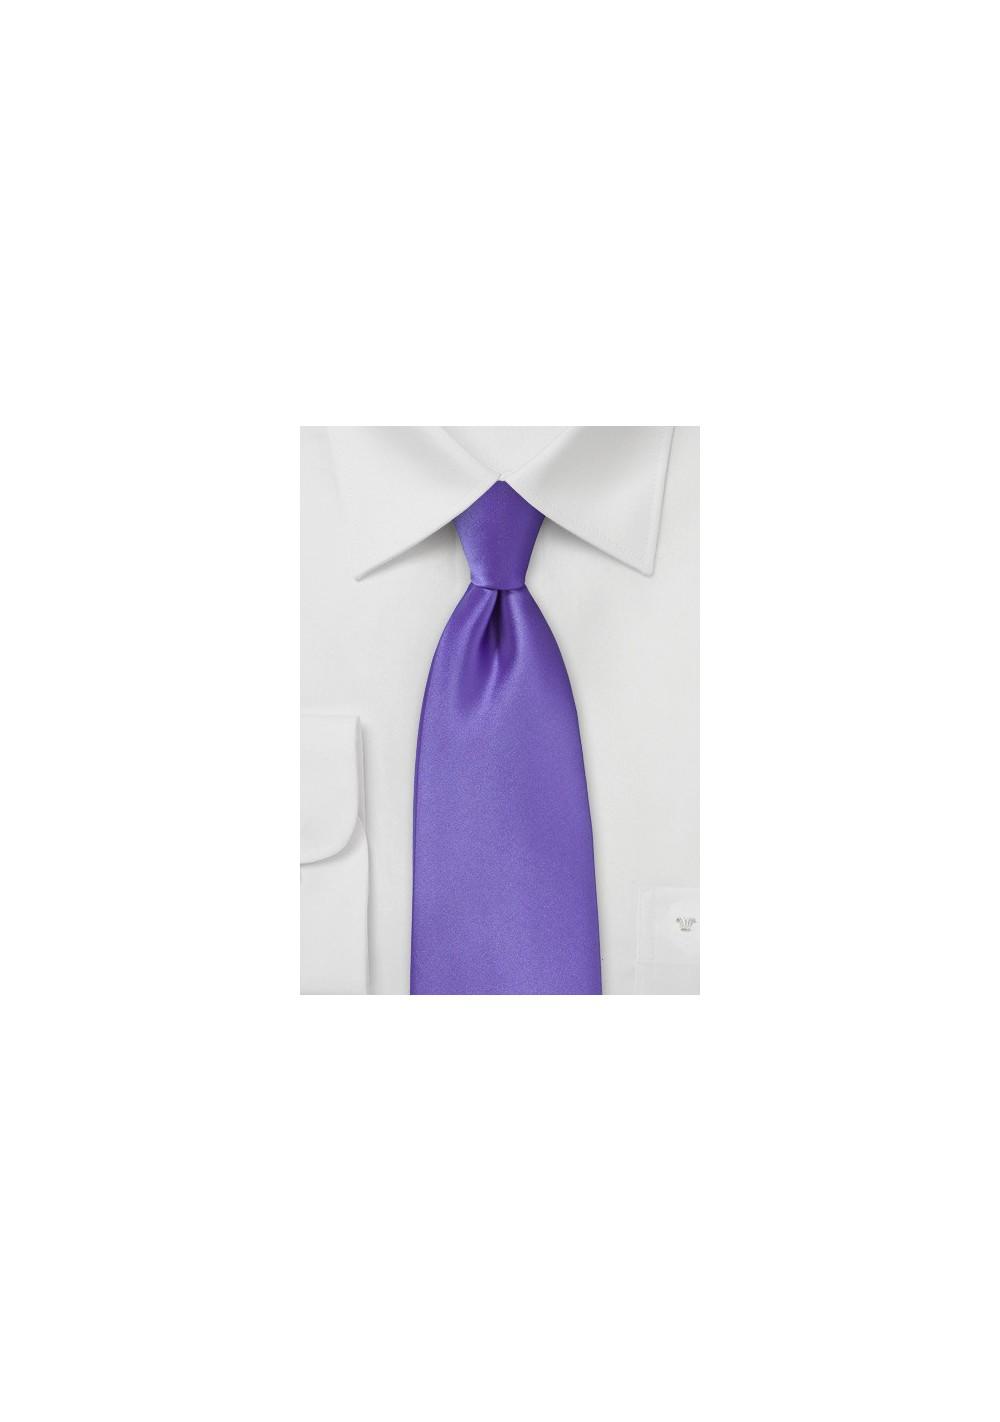 Freesia Purple Tie in XL Length